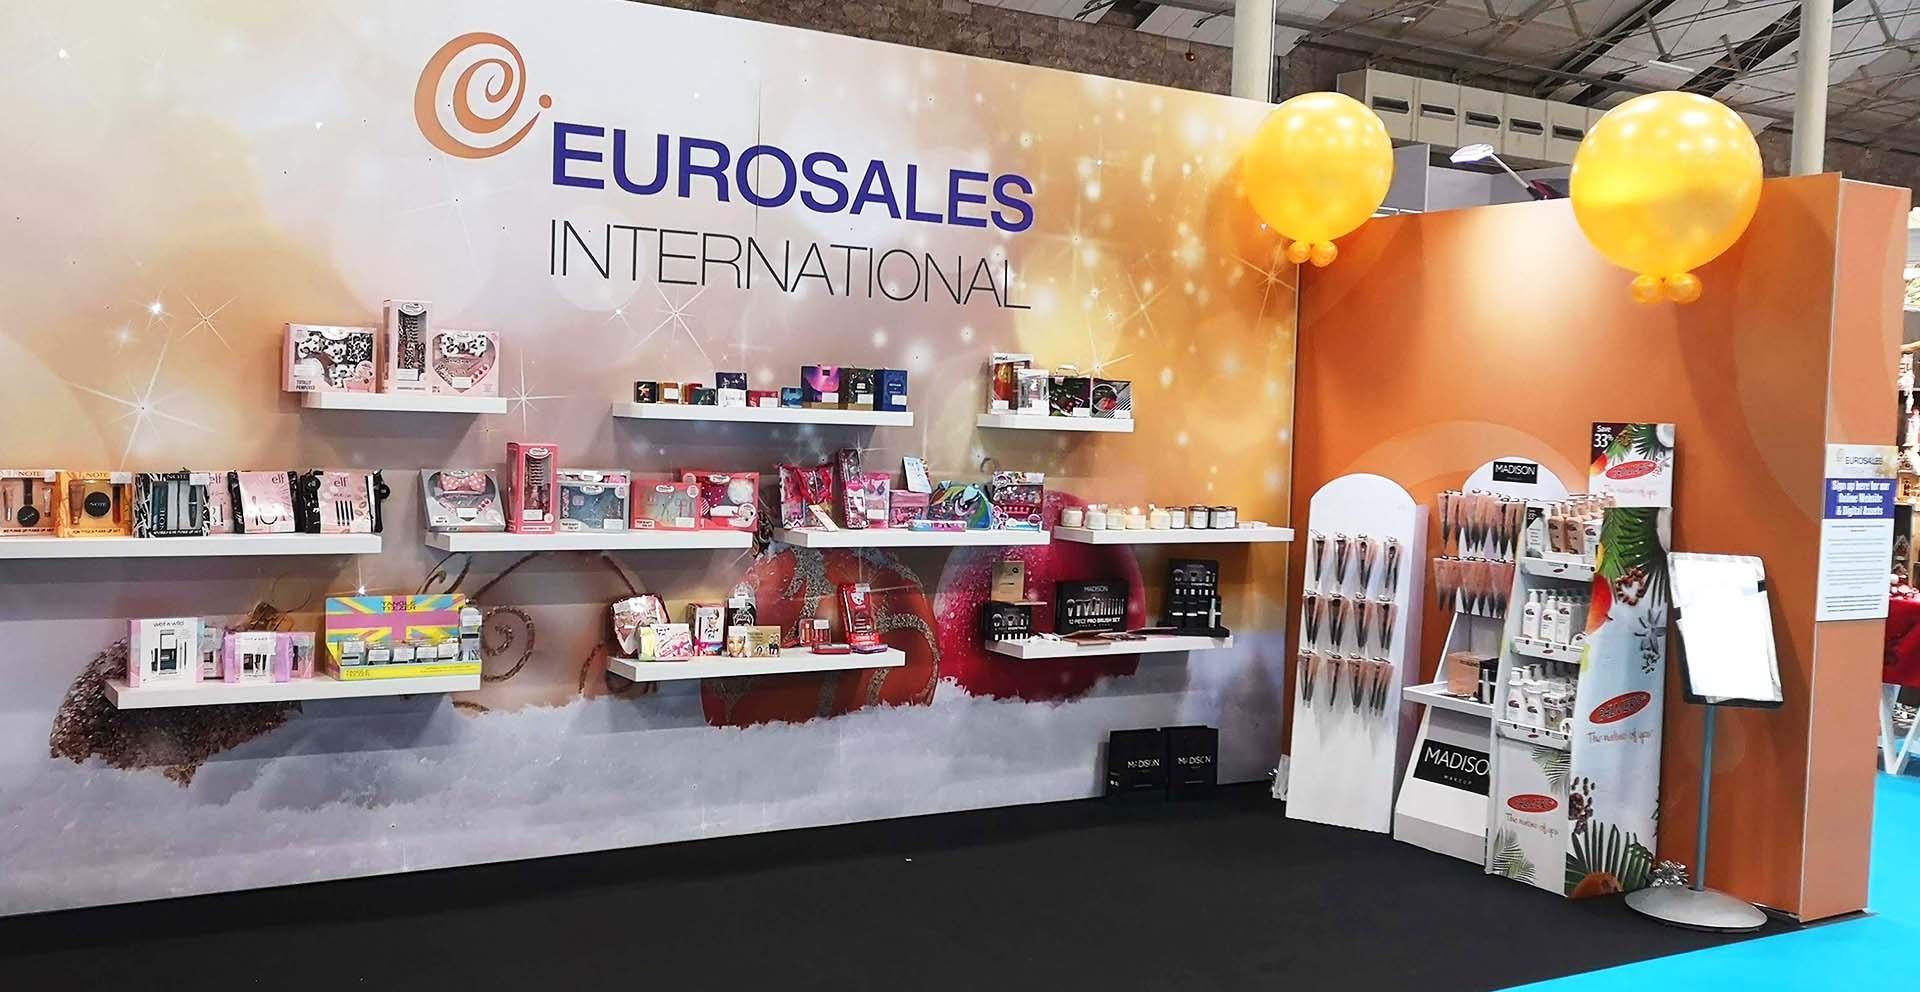 Eurosales International